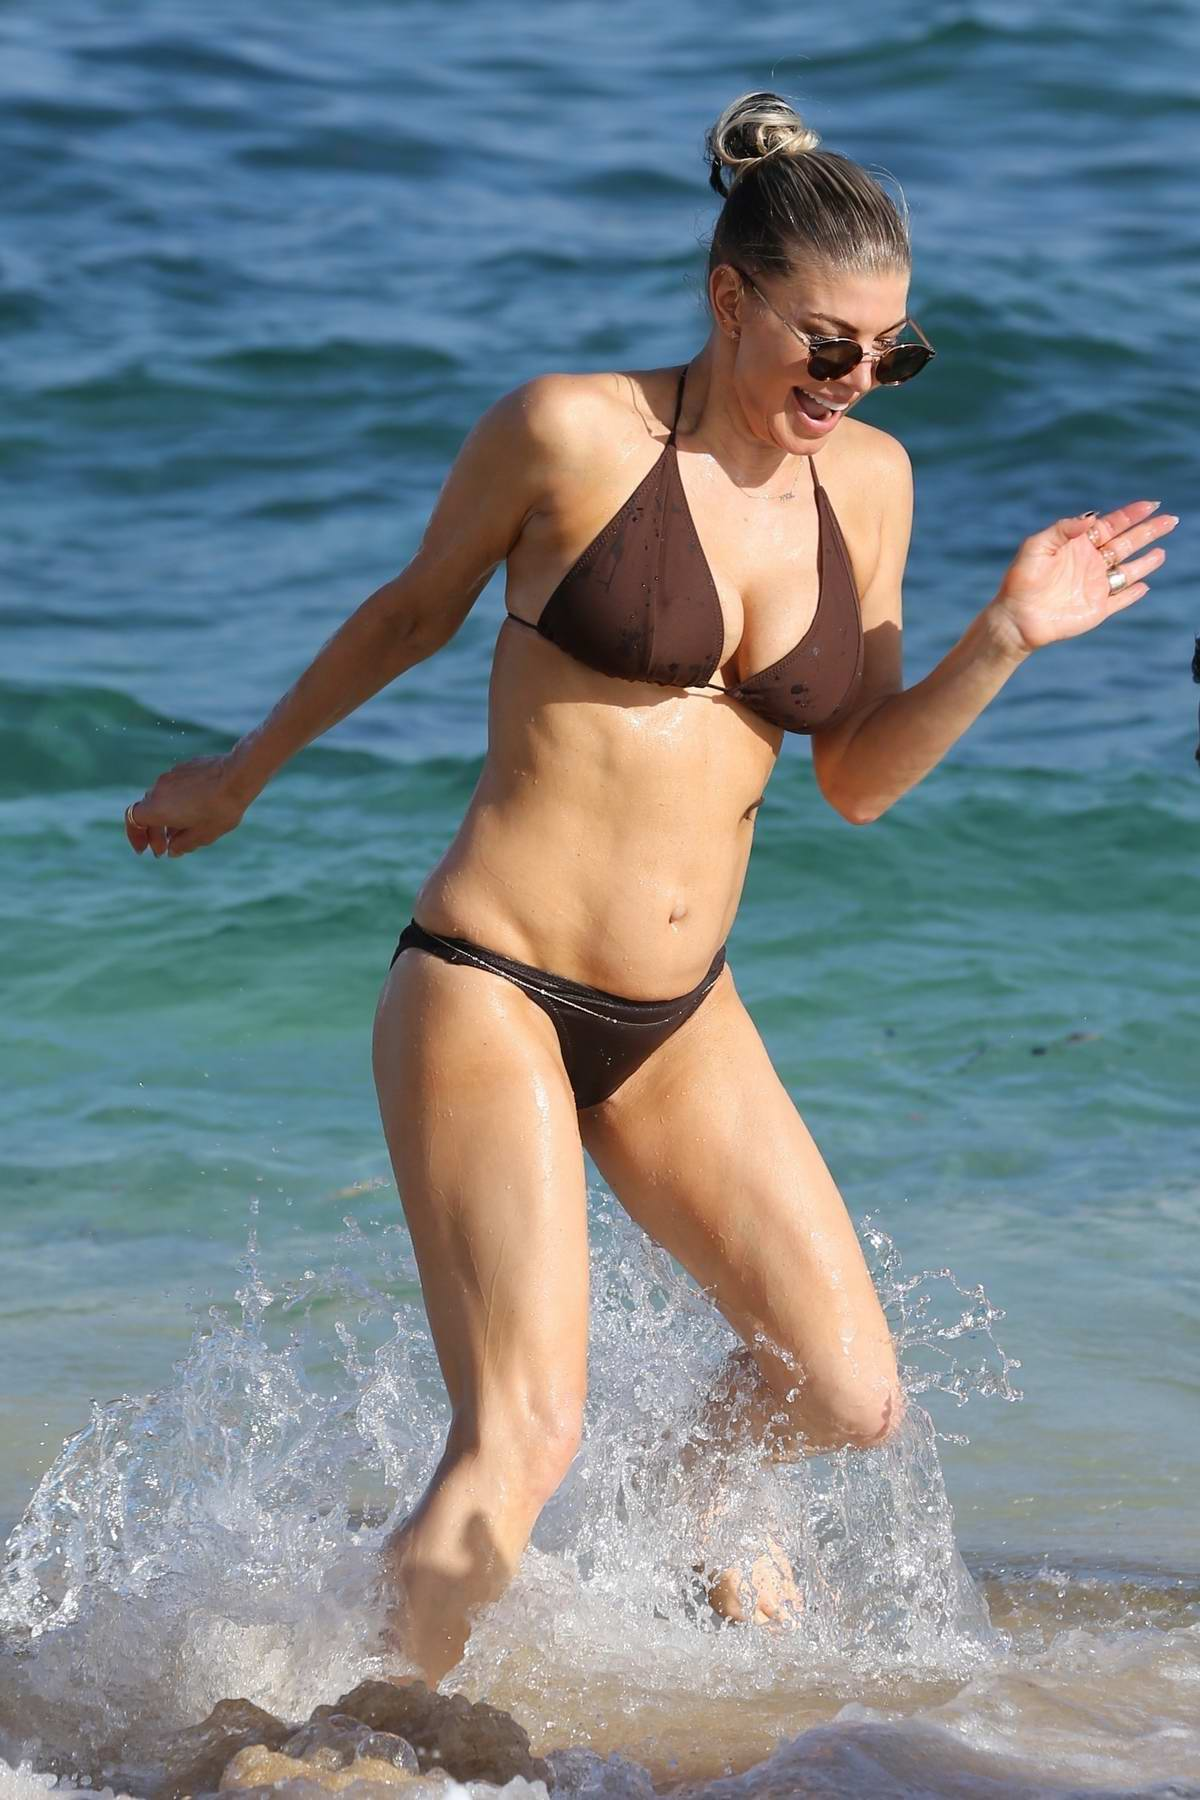 Fergie Duhamel in a Bikini enjoys her summer from home on vacation in Kauai, Hawaii